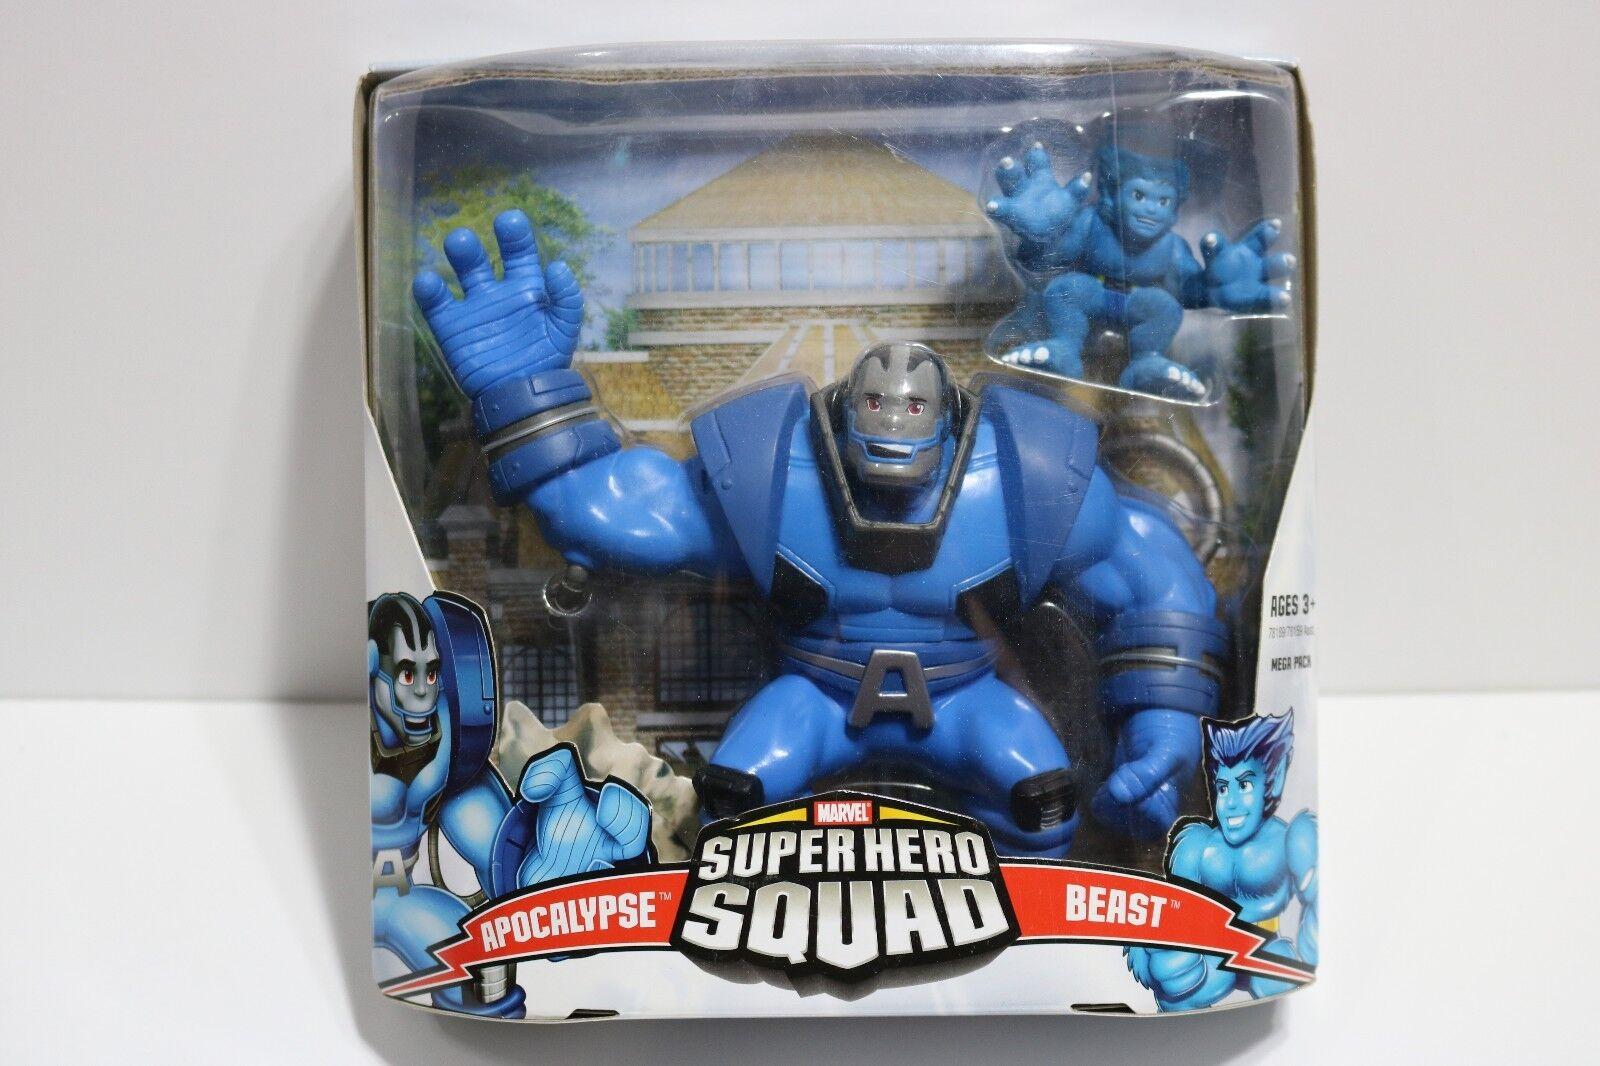 Marvel - superhelden - team x - men - apokalypse komplette mega festgesetzten betrag w   pelziges biest